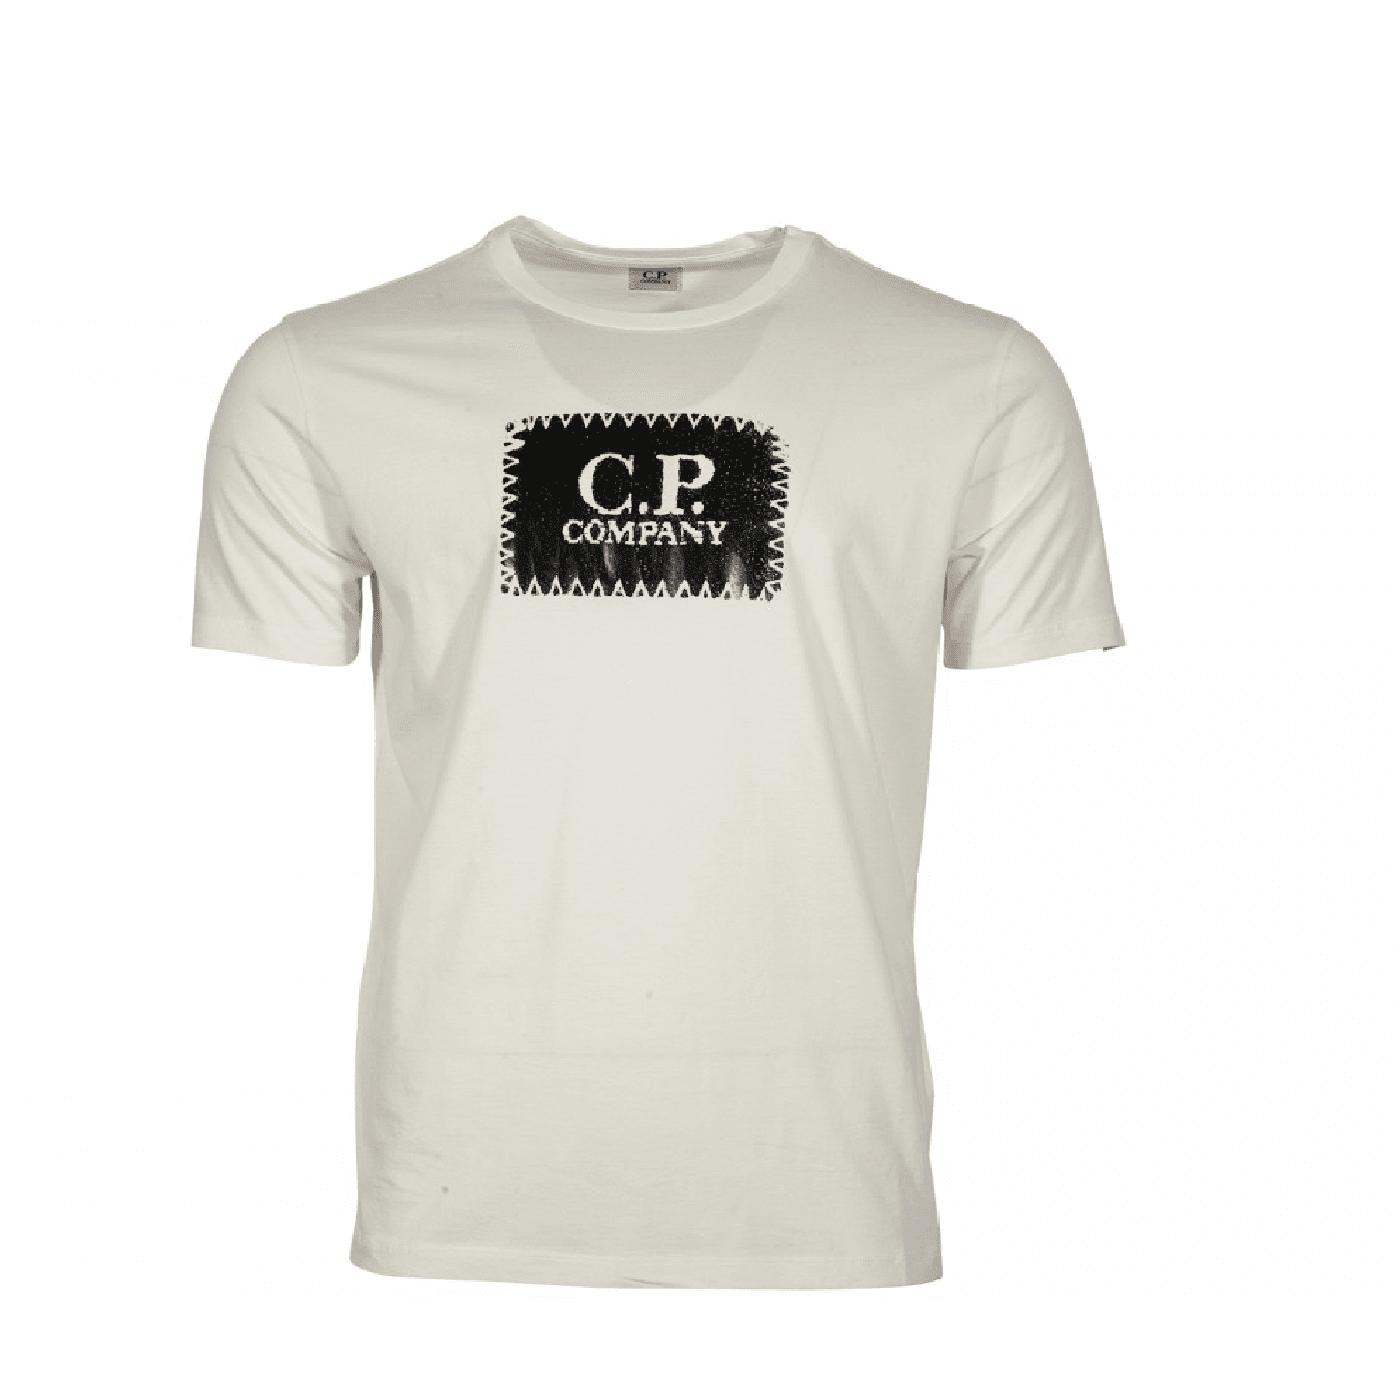 Tee shirt CP Company logo blanc